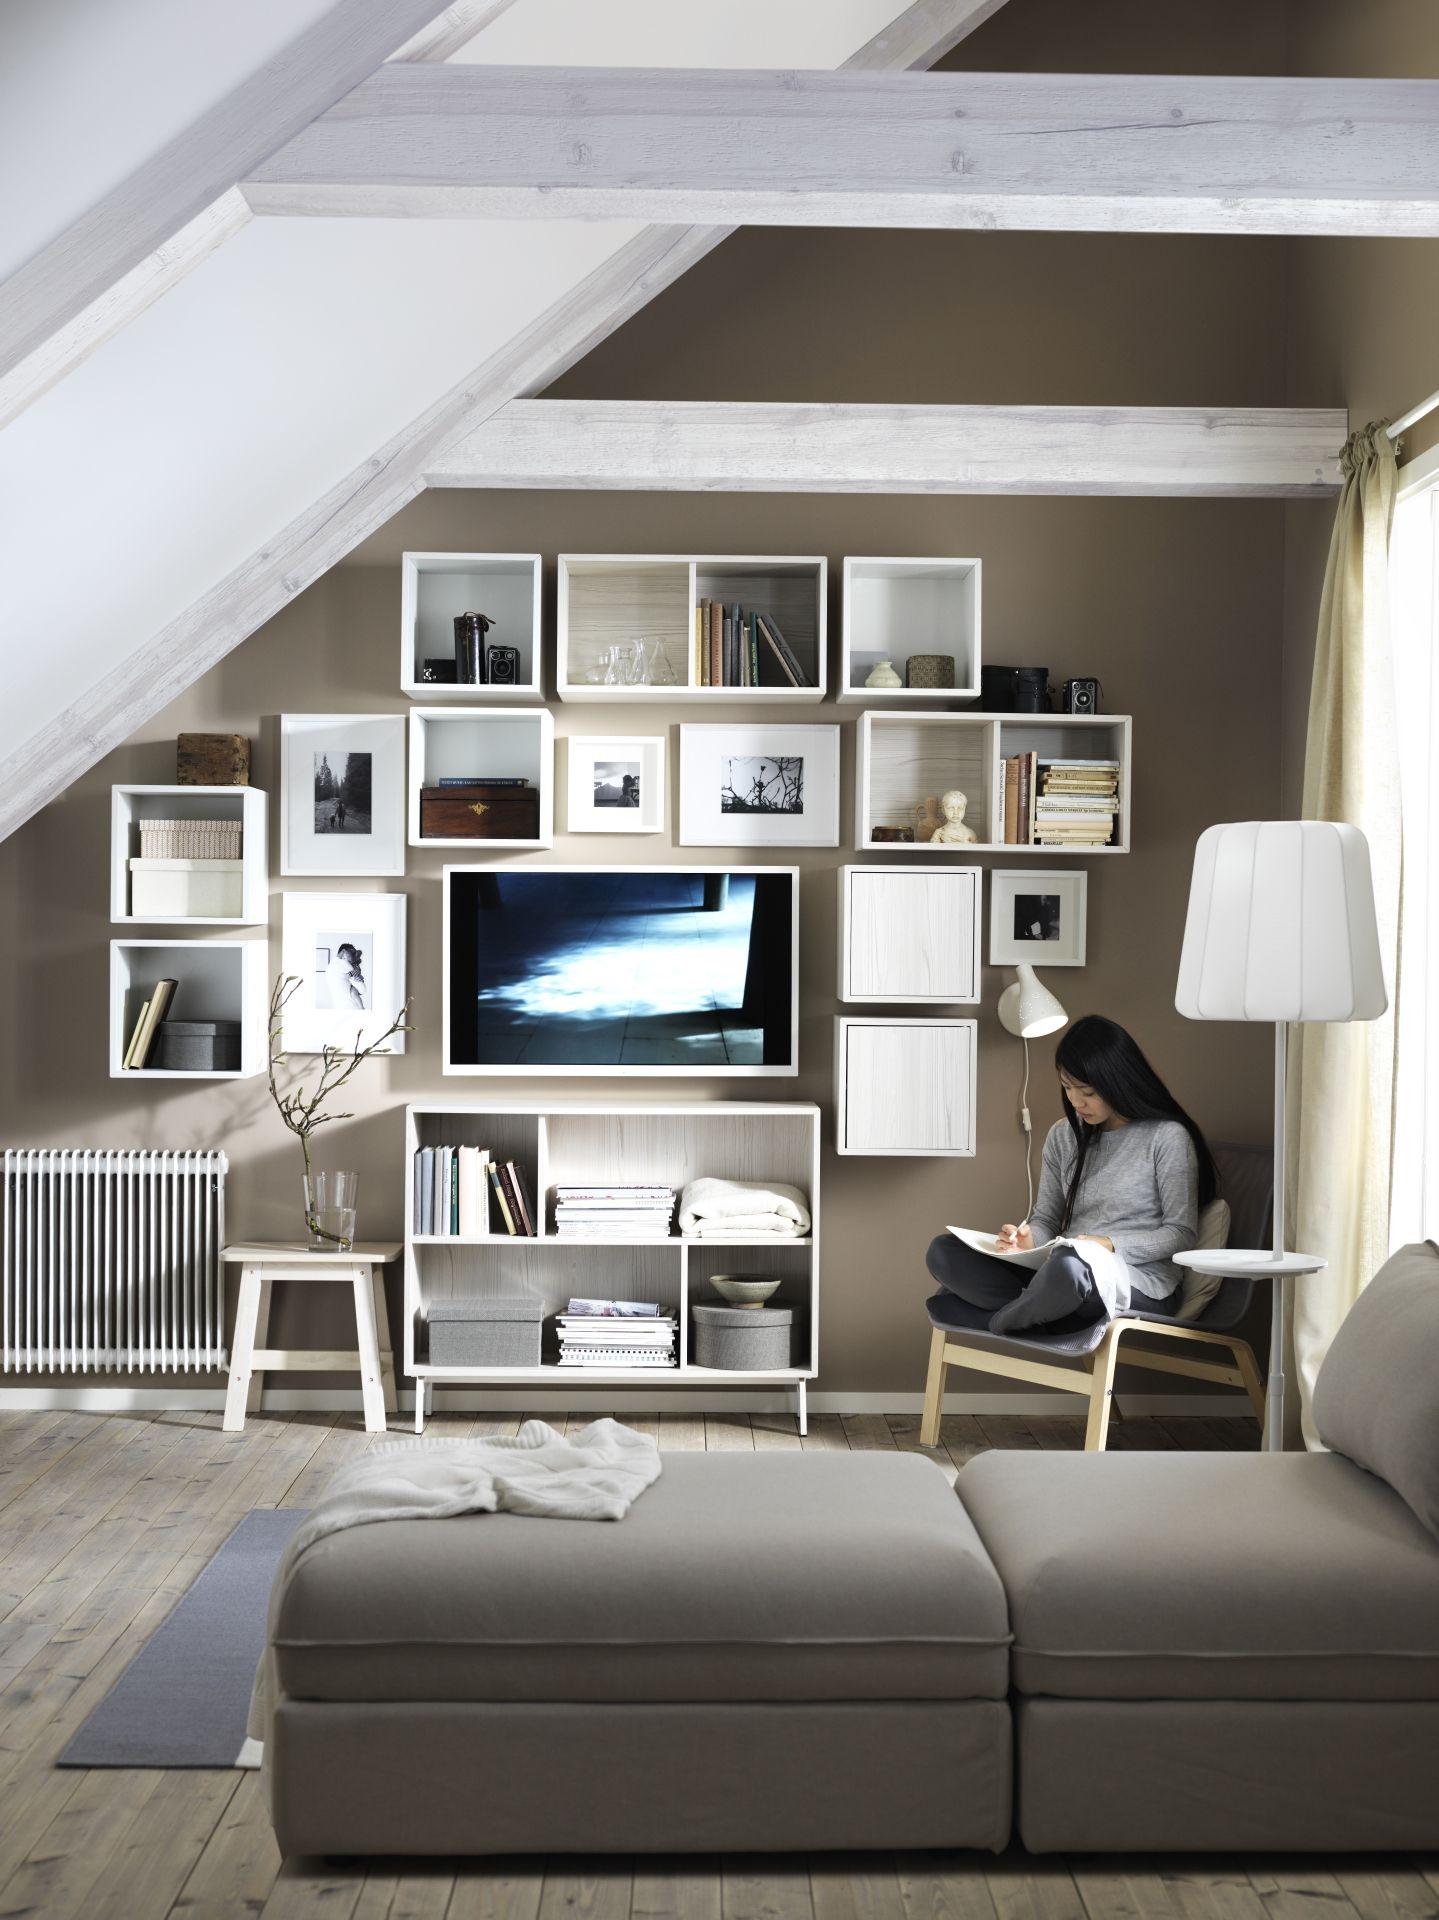 ikea vallentuna grey living room popular modern valje home inspiration pinterest. Black Bedroom Furniture Sets. Home Design Ideas